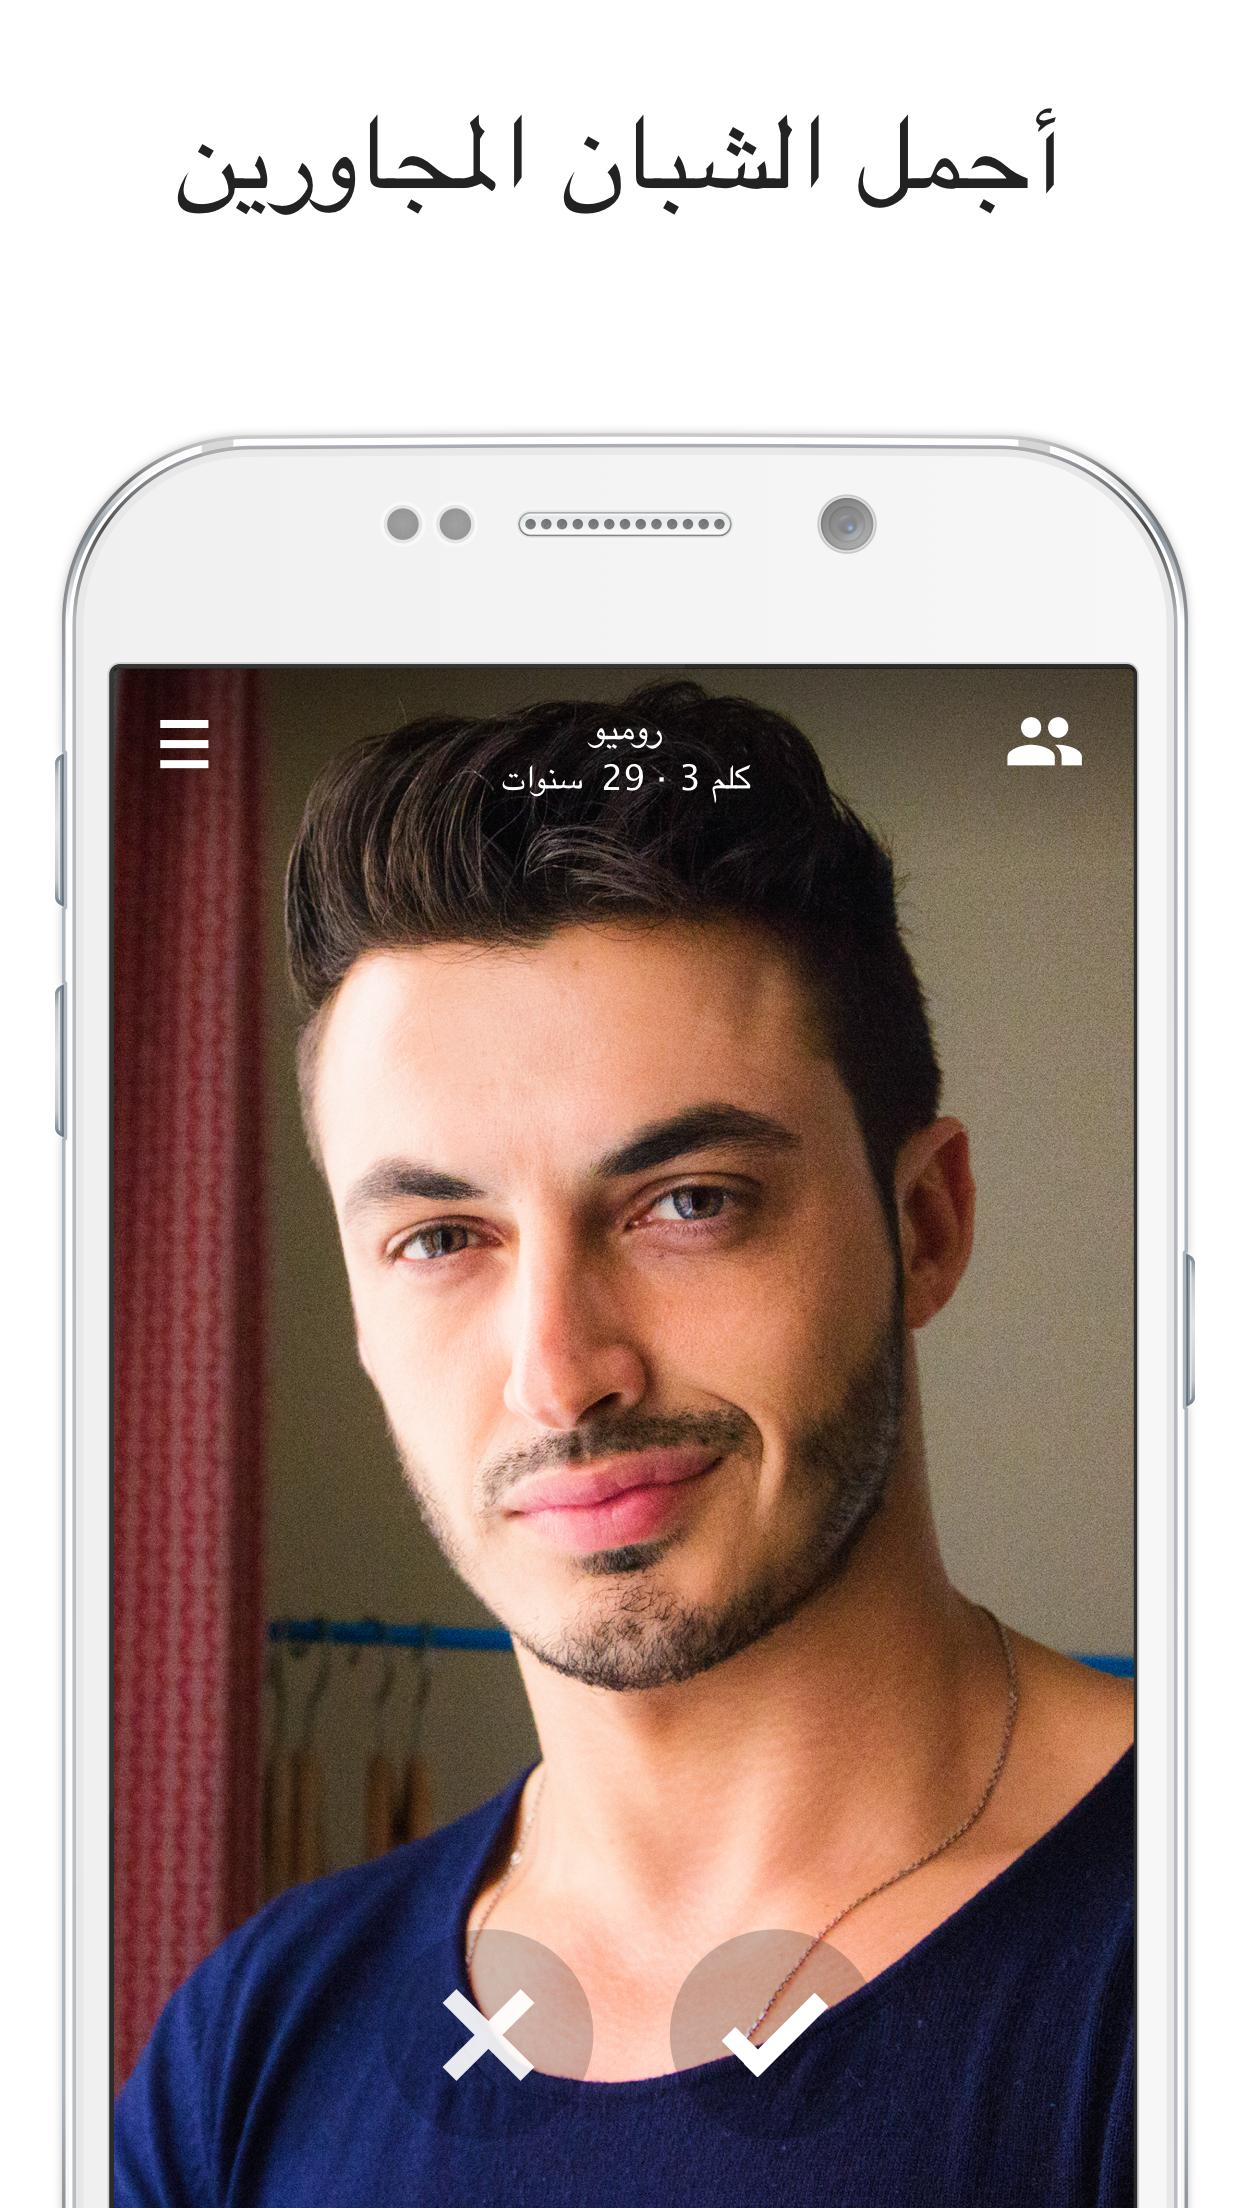 Gay Dating Gay Chat DISCO app analytics